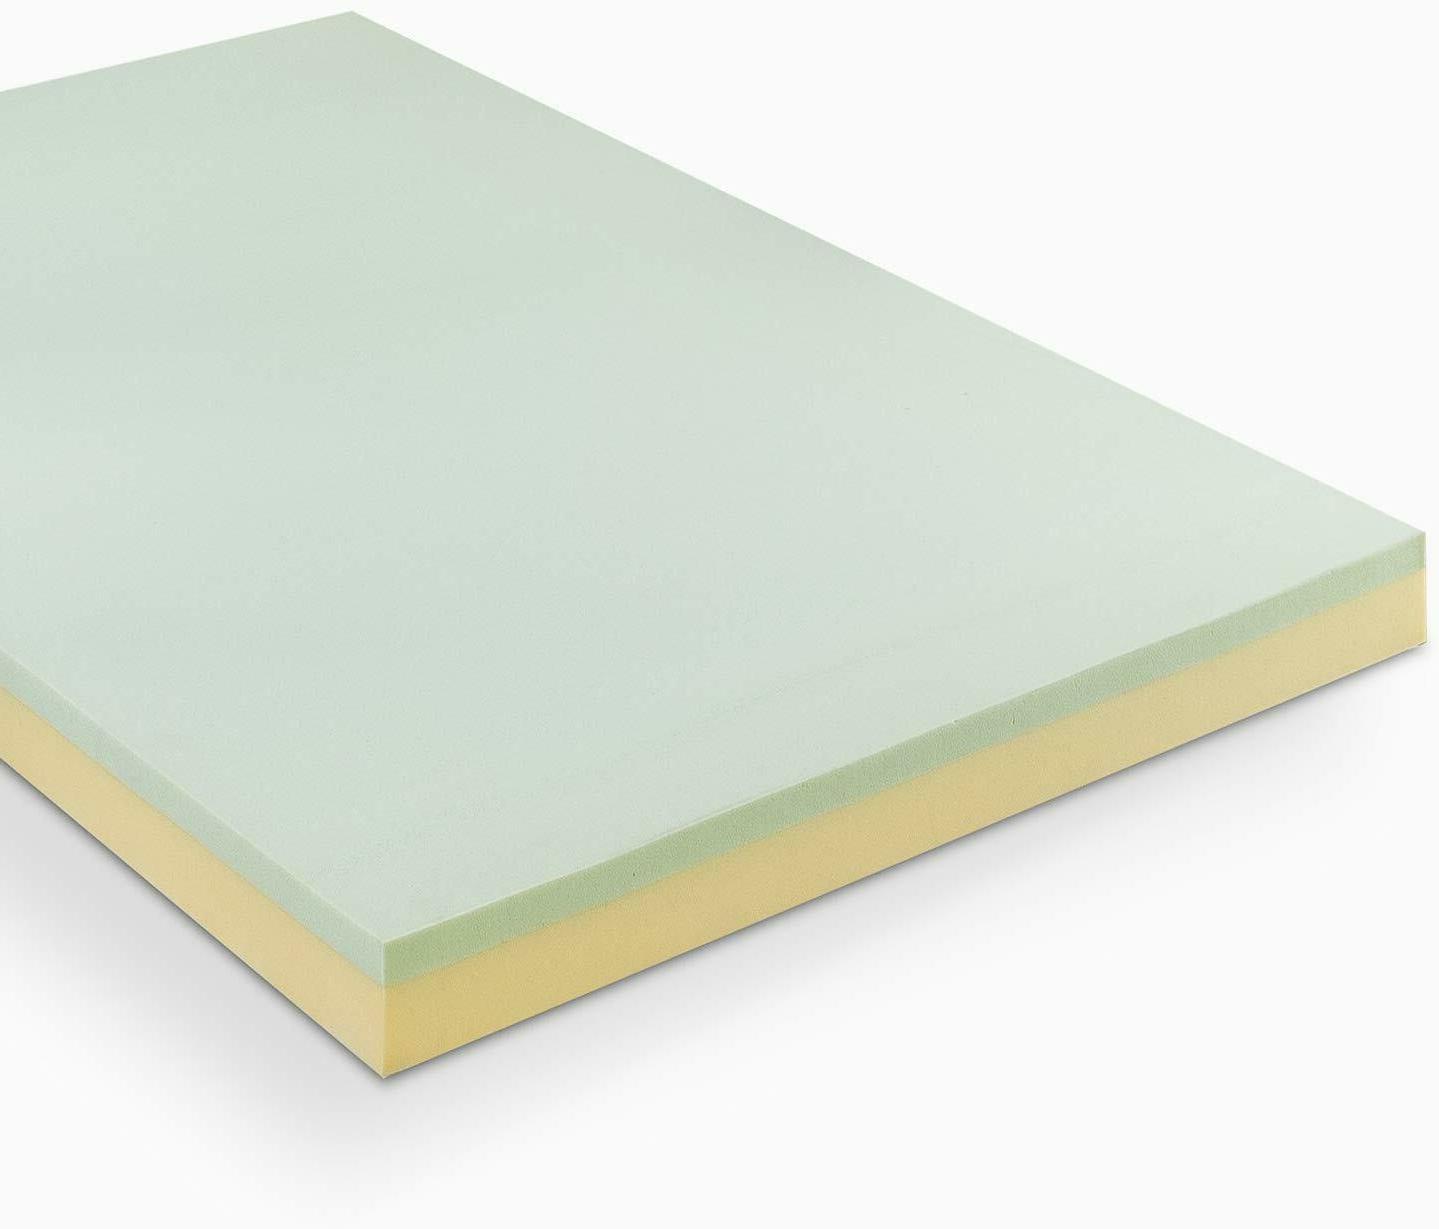 4 inch green tea memory foam mattress